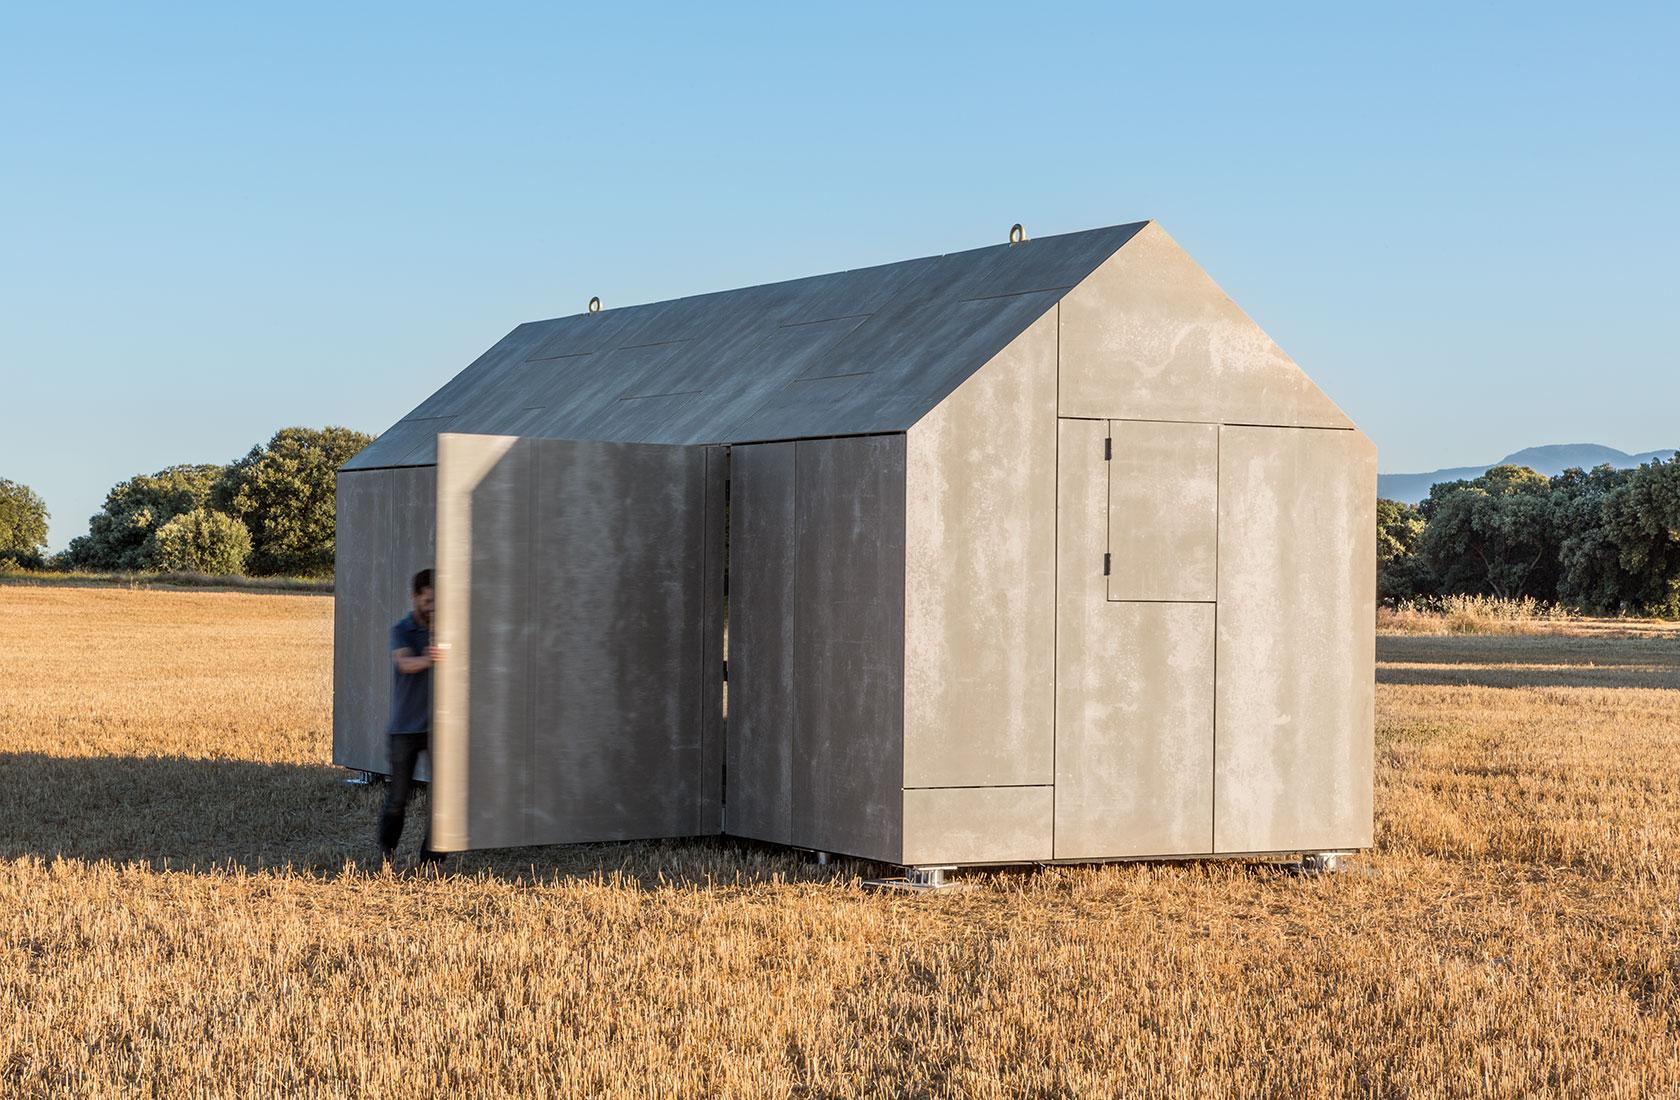 Exterior de la casa transportable construida en madera por ABATON